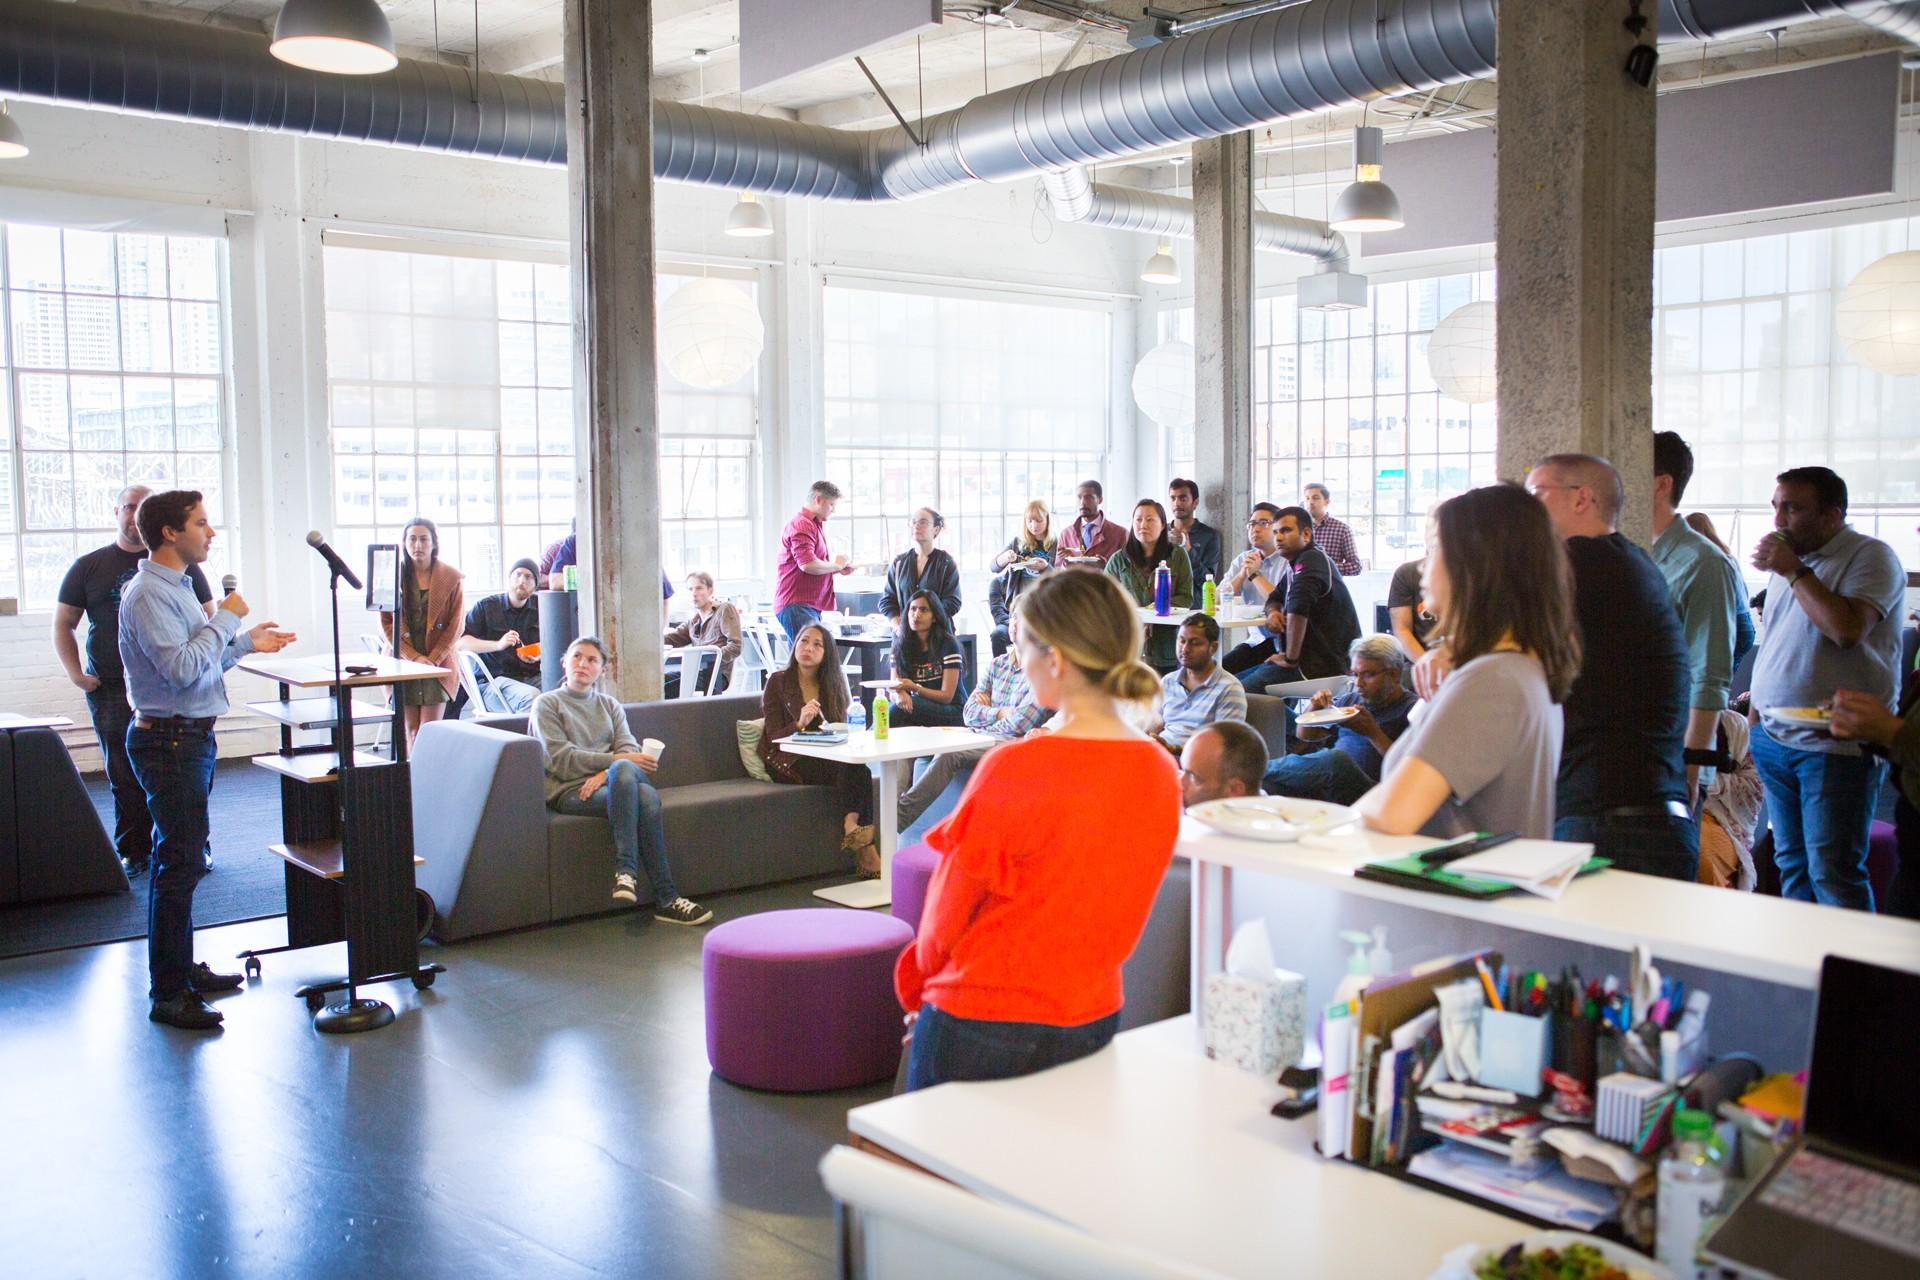 Life360 Jobs and Company Culture